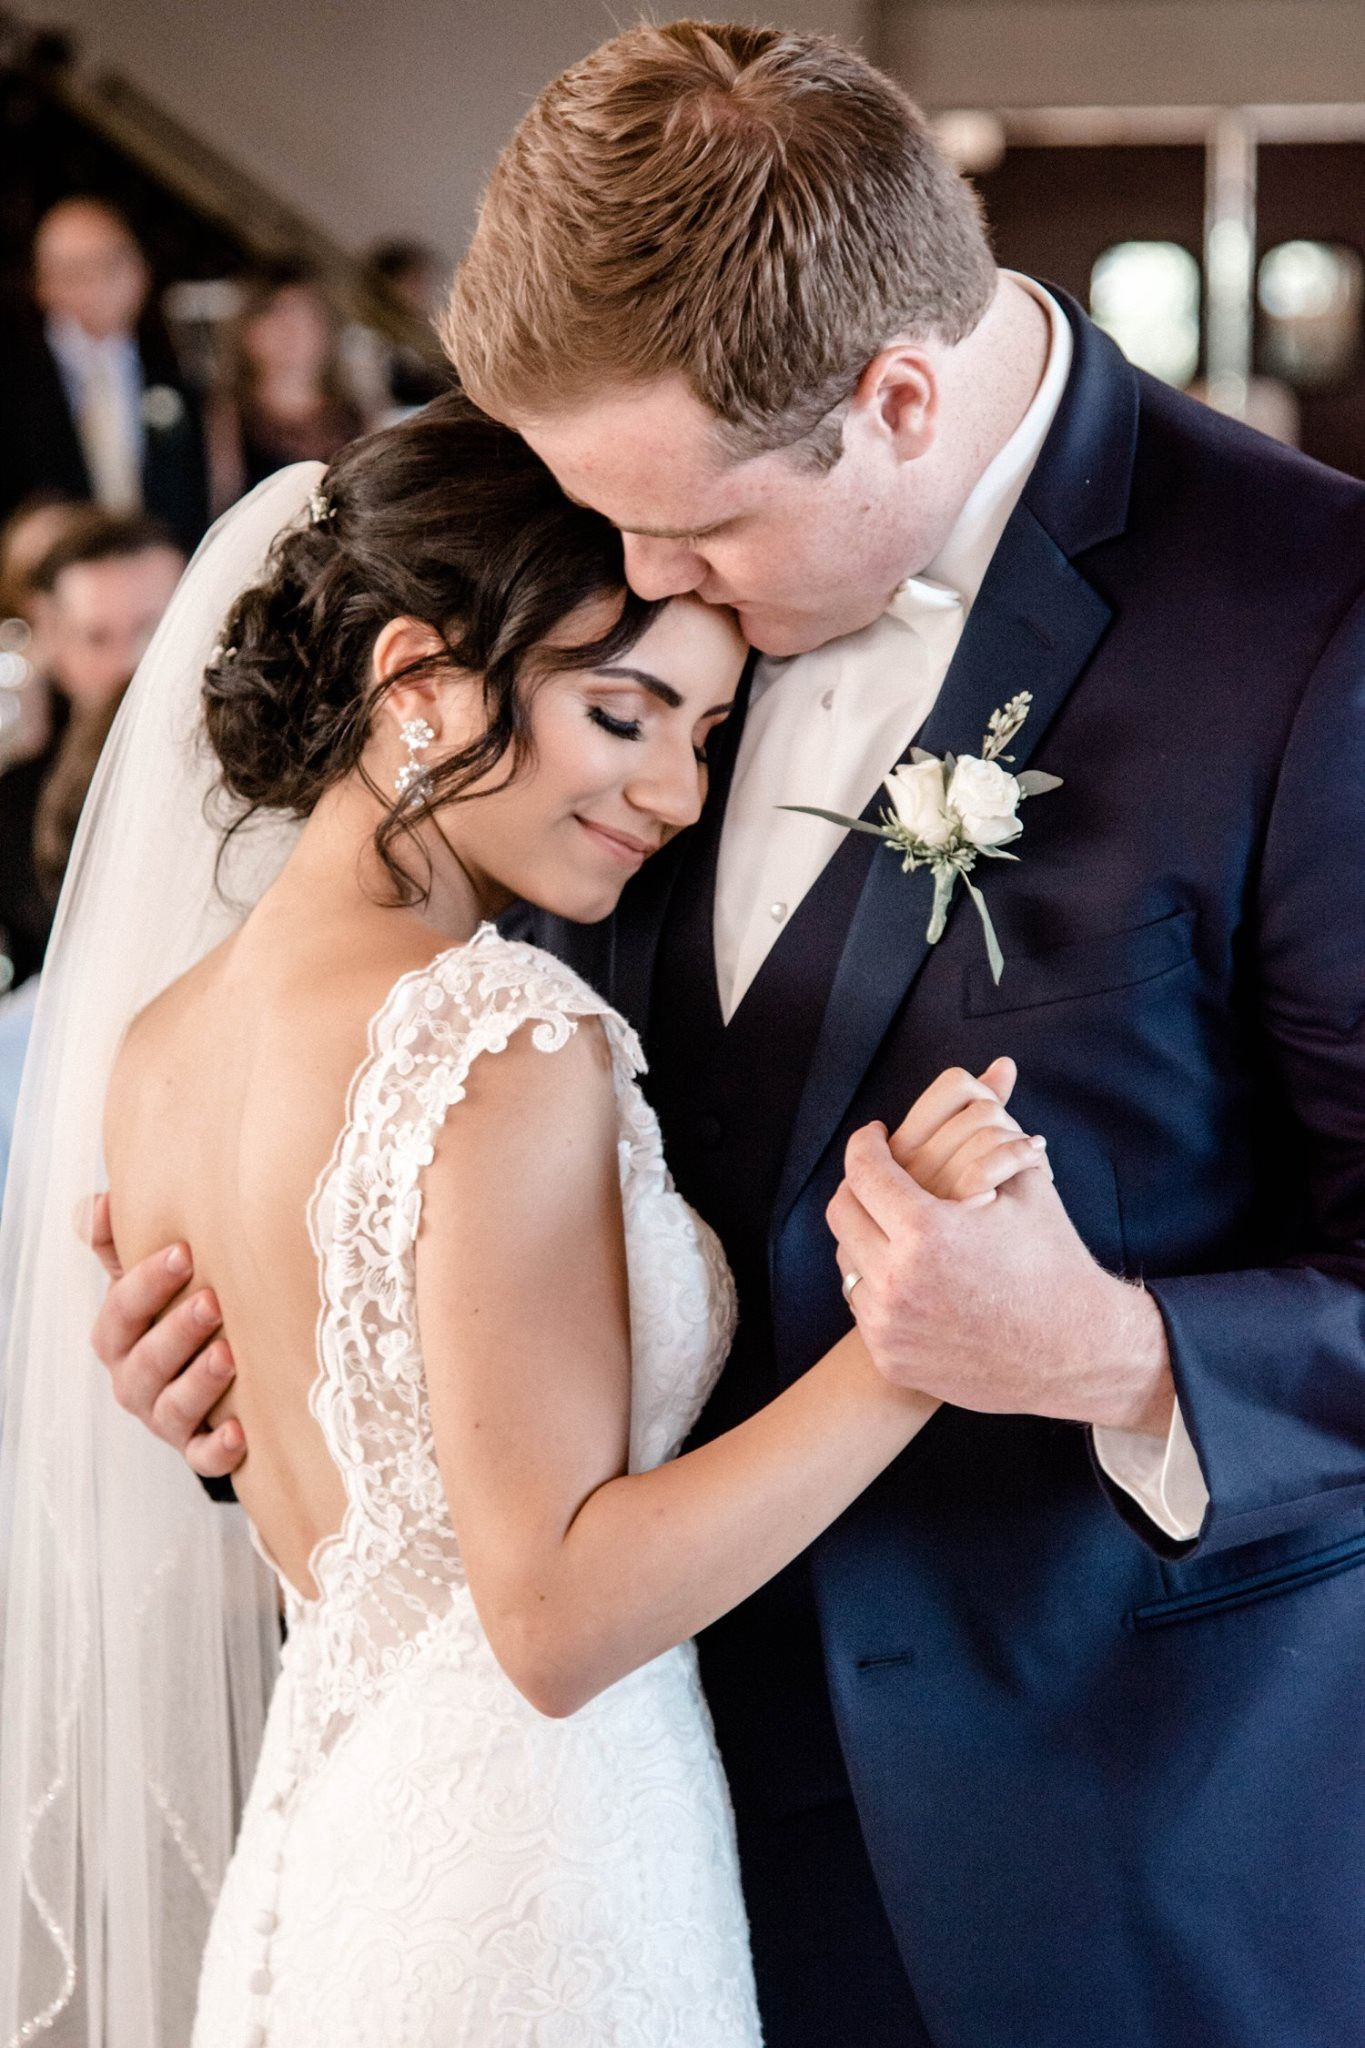 Bride And Groom First Dance Wedding Photo Inspo Indianapolis Wedding Photographer Bride And Groom Photo Stunning Wedding Photos